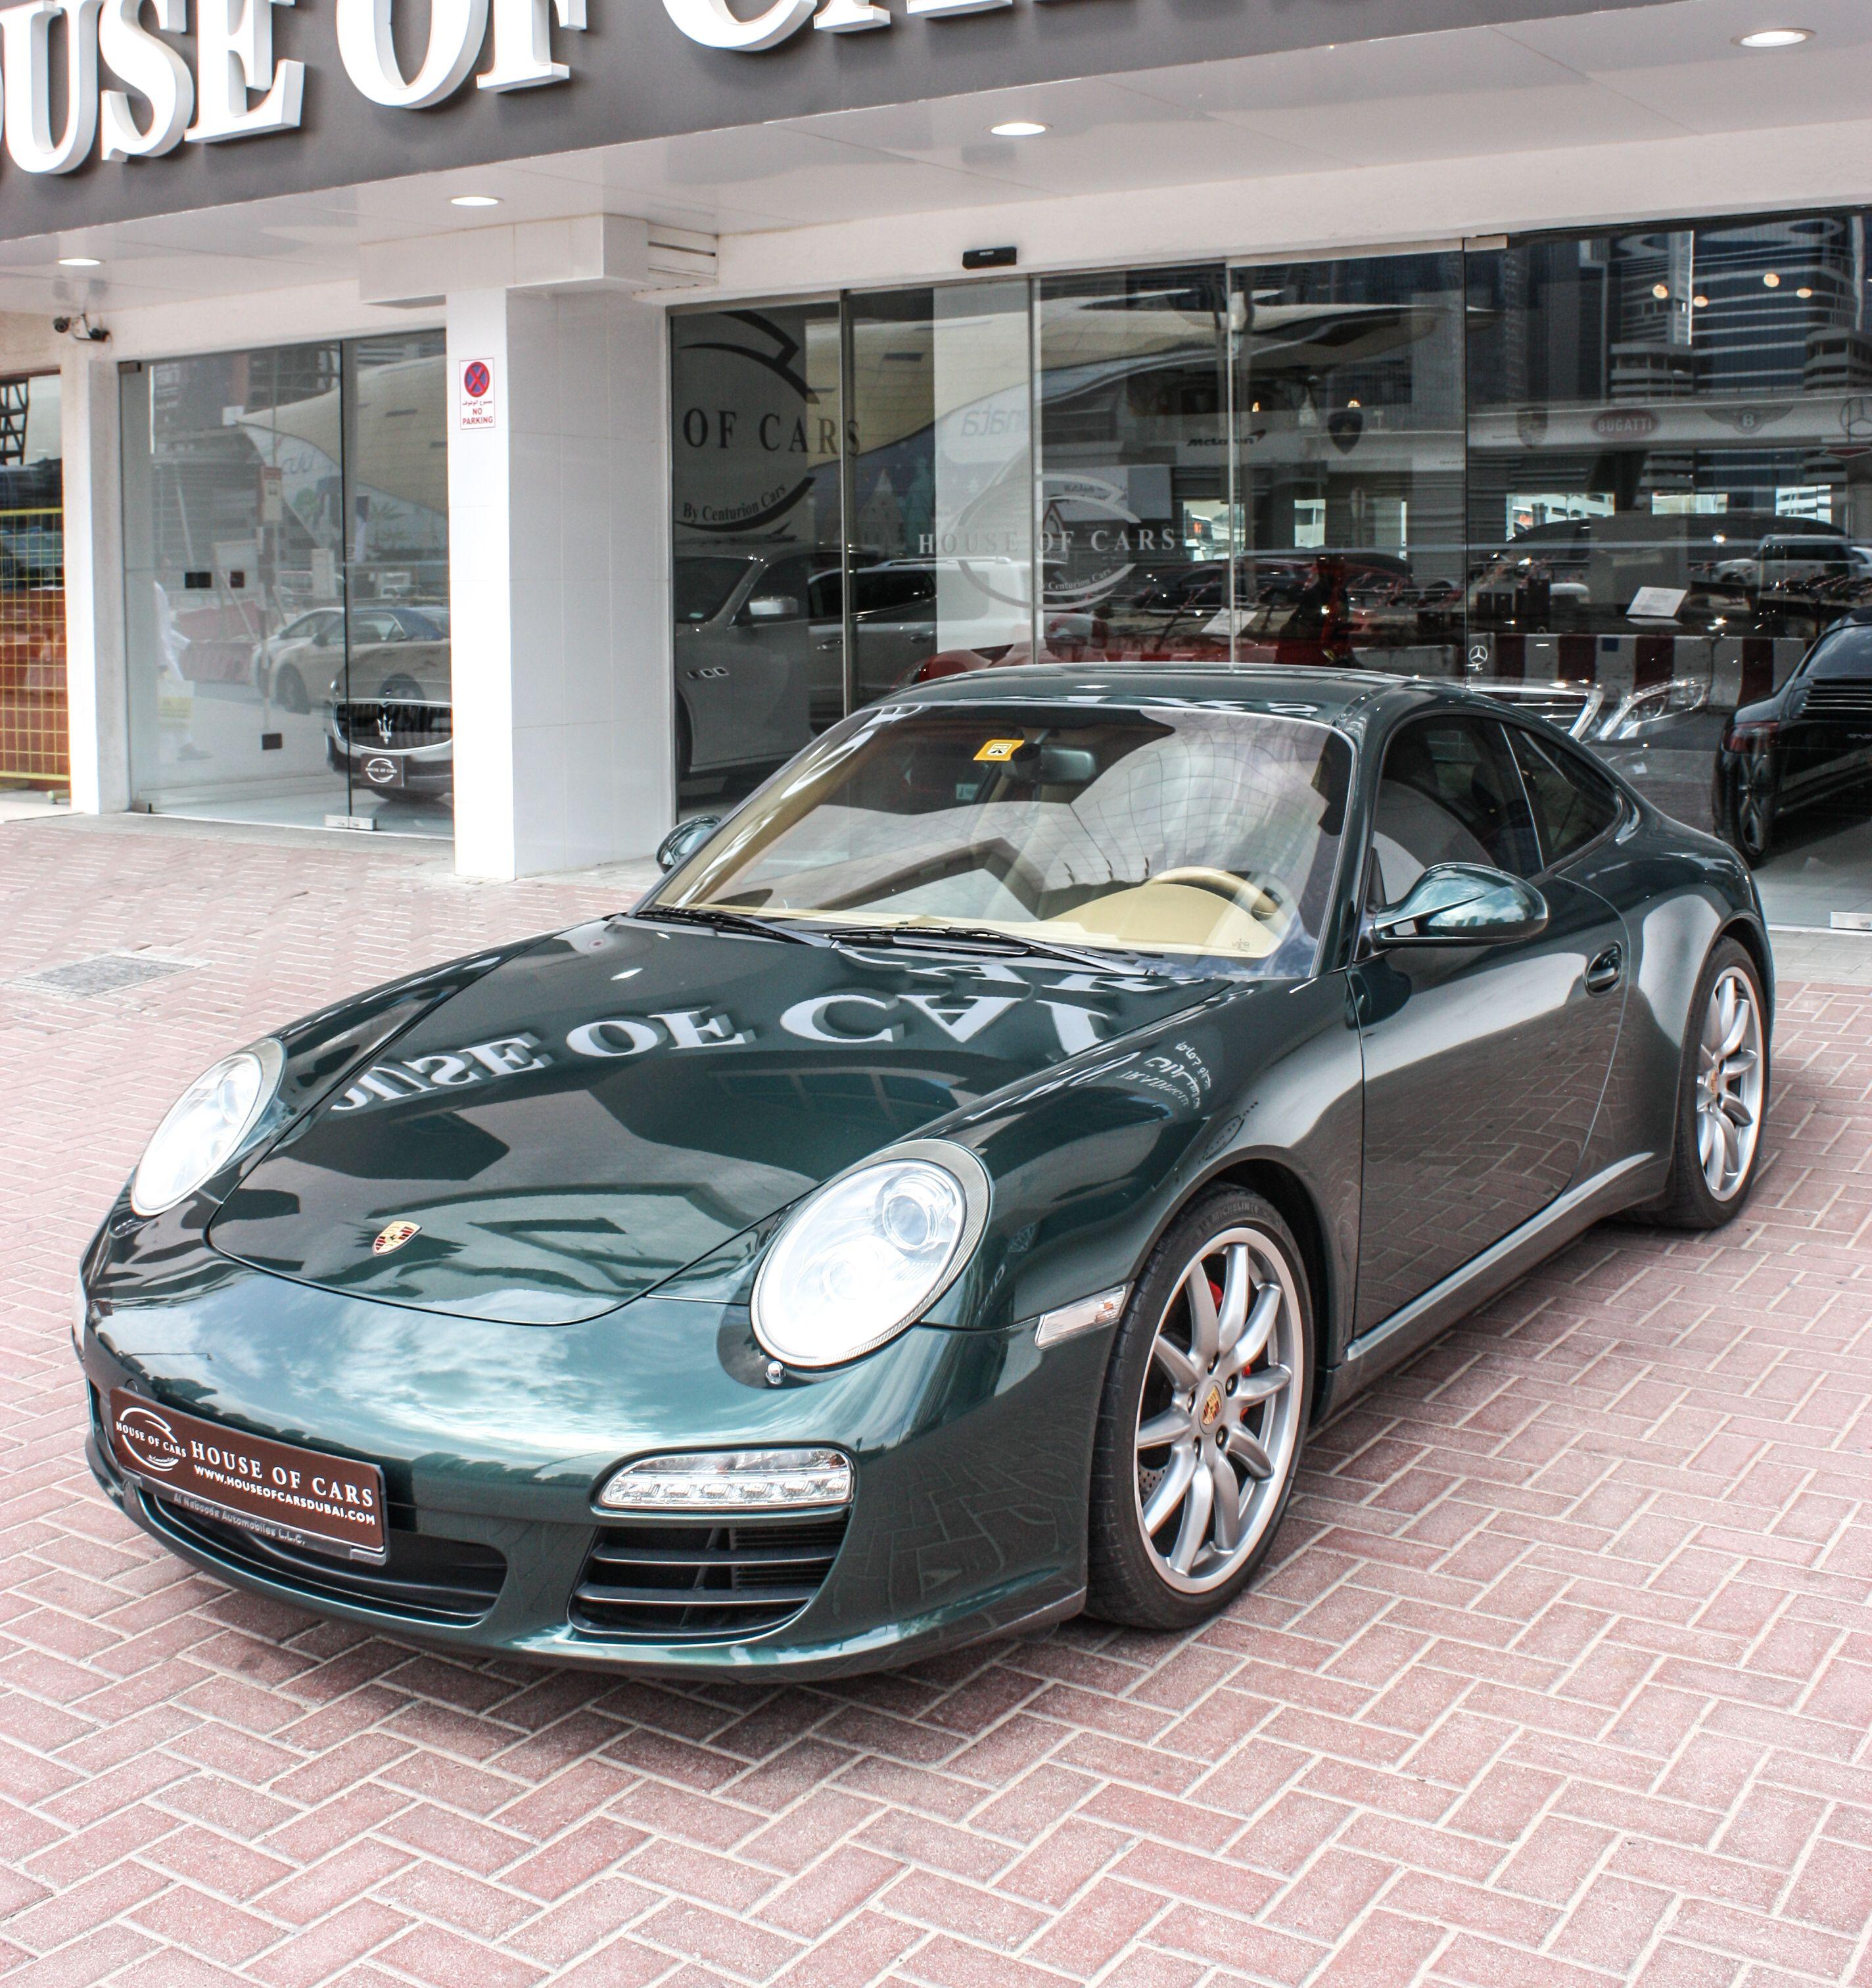 Pin By House Of Cars Dubai On PORSCHE DUBAI